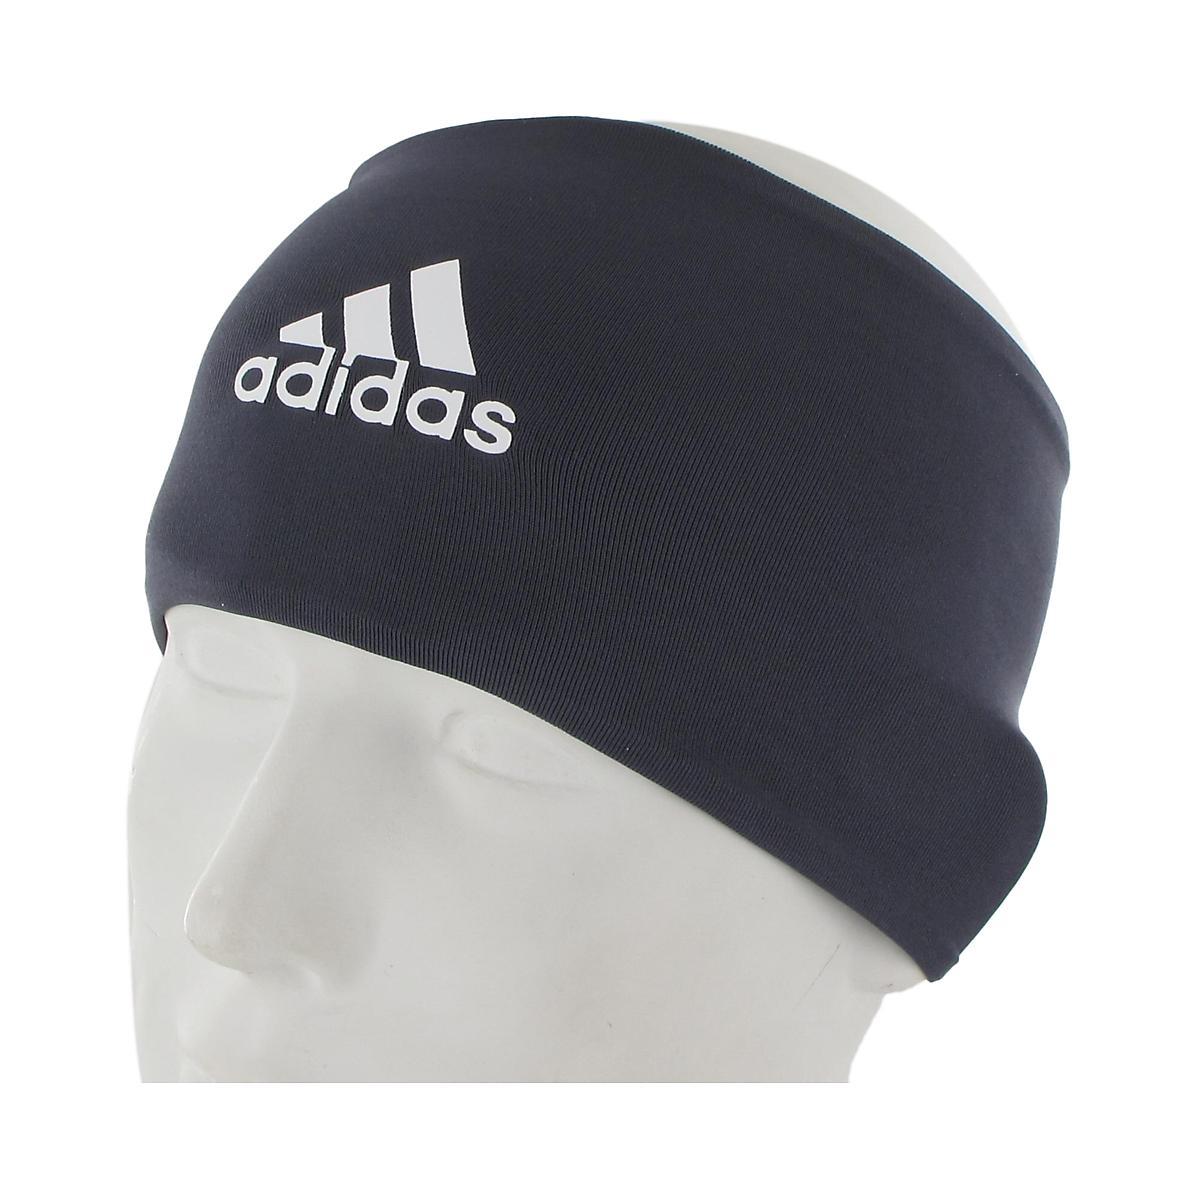 adidas�Football Skull Wrap